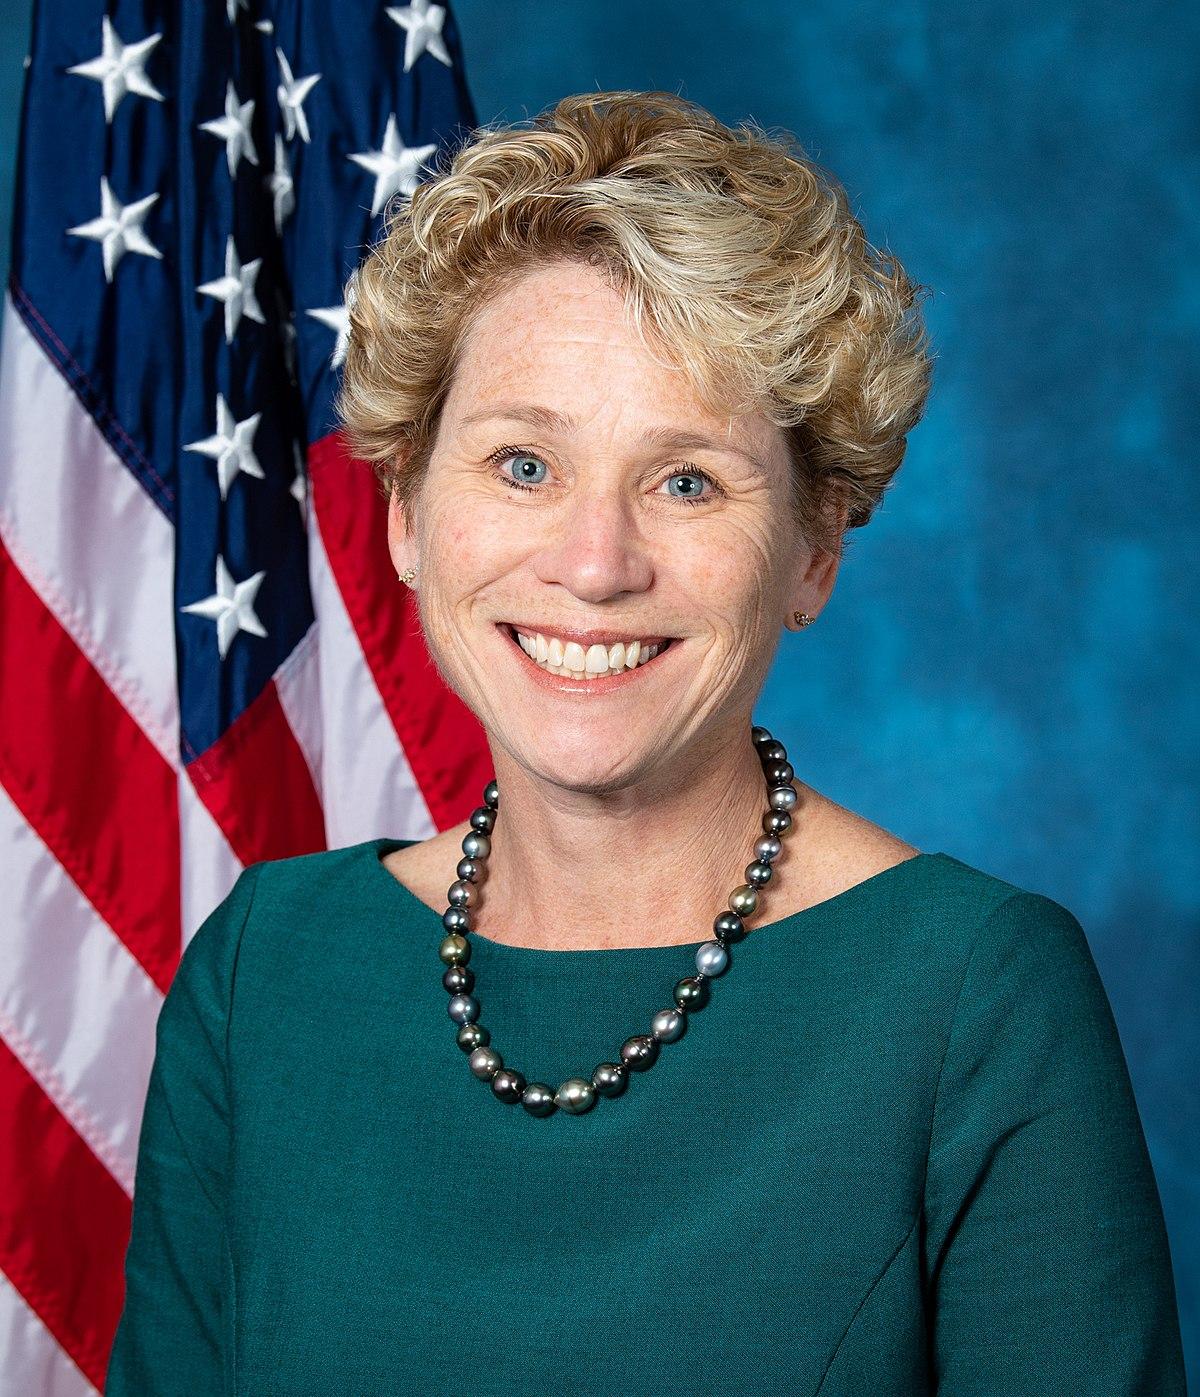 Chrissy Houlahan: U.S. Congress, District 6